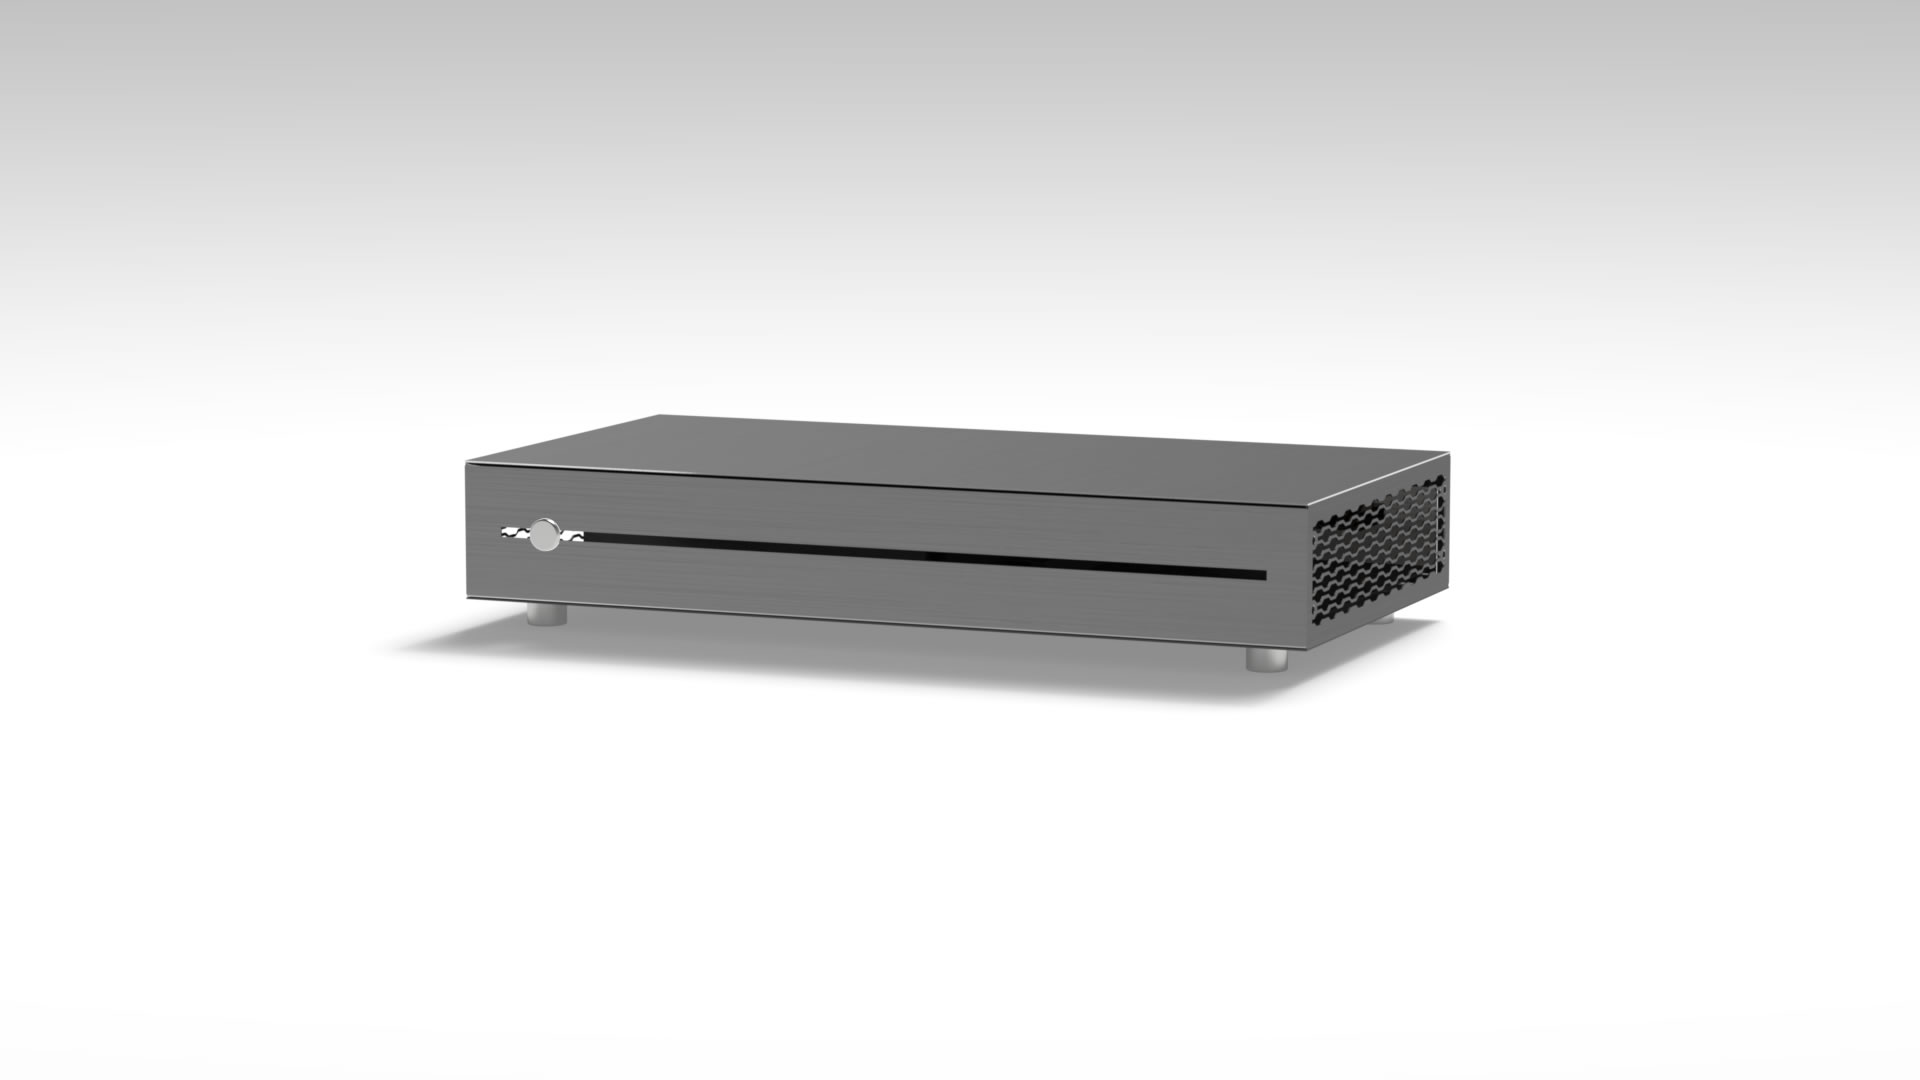 Desktop-Isometric-Front.jpg